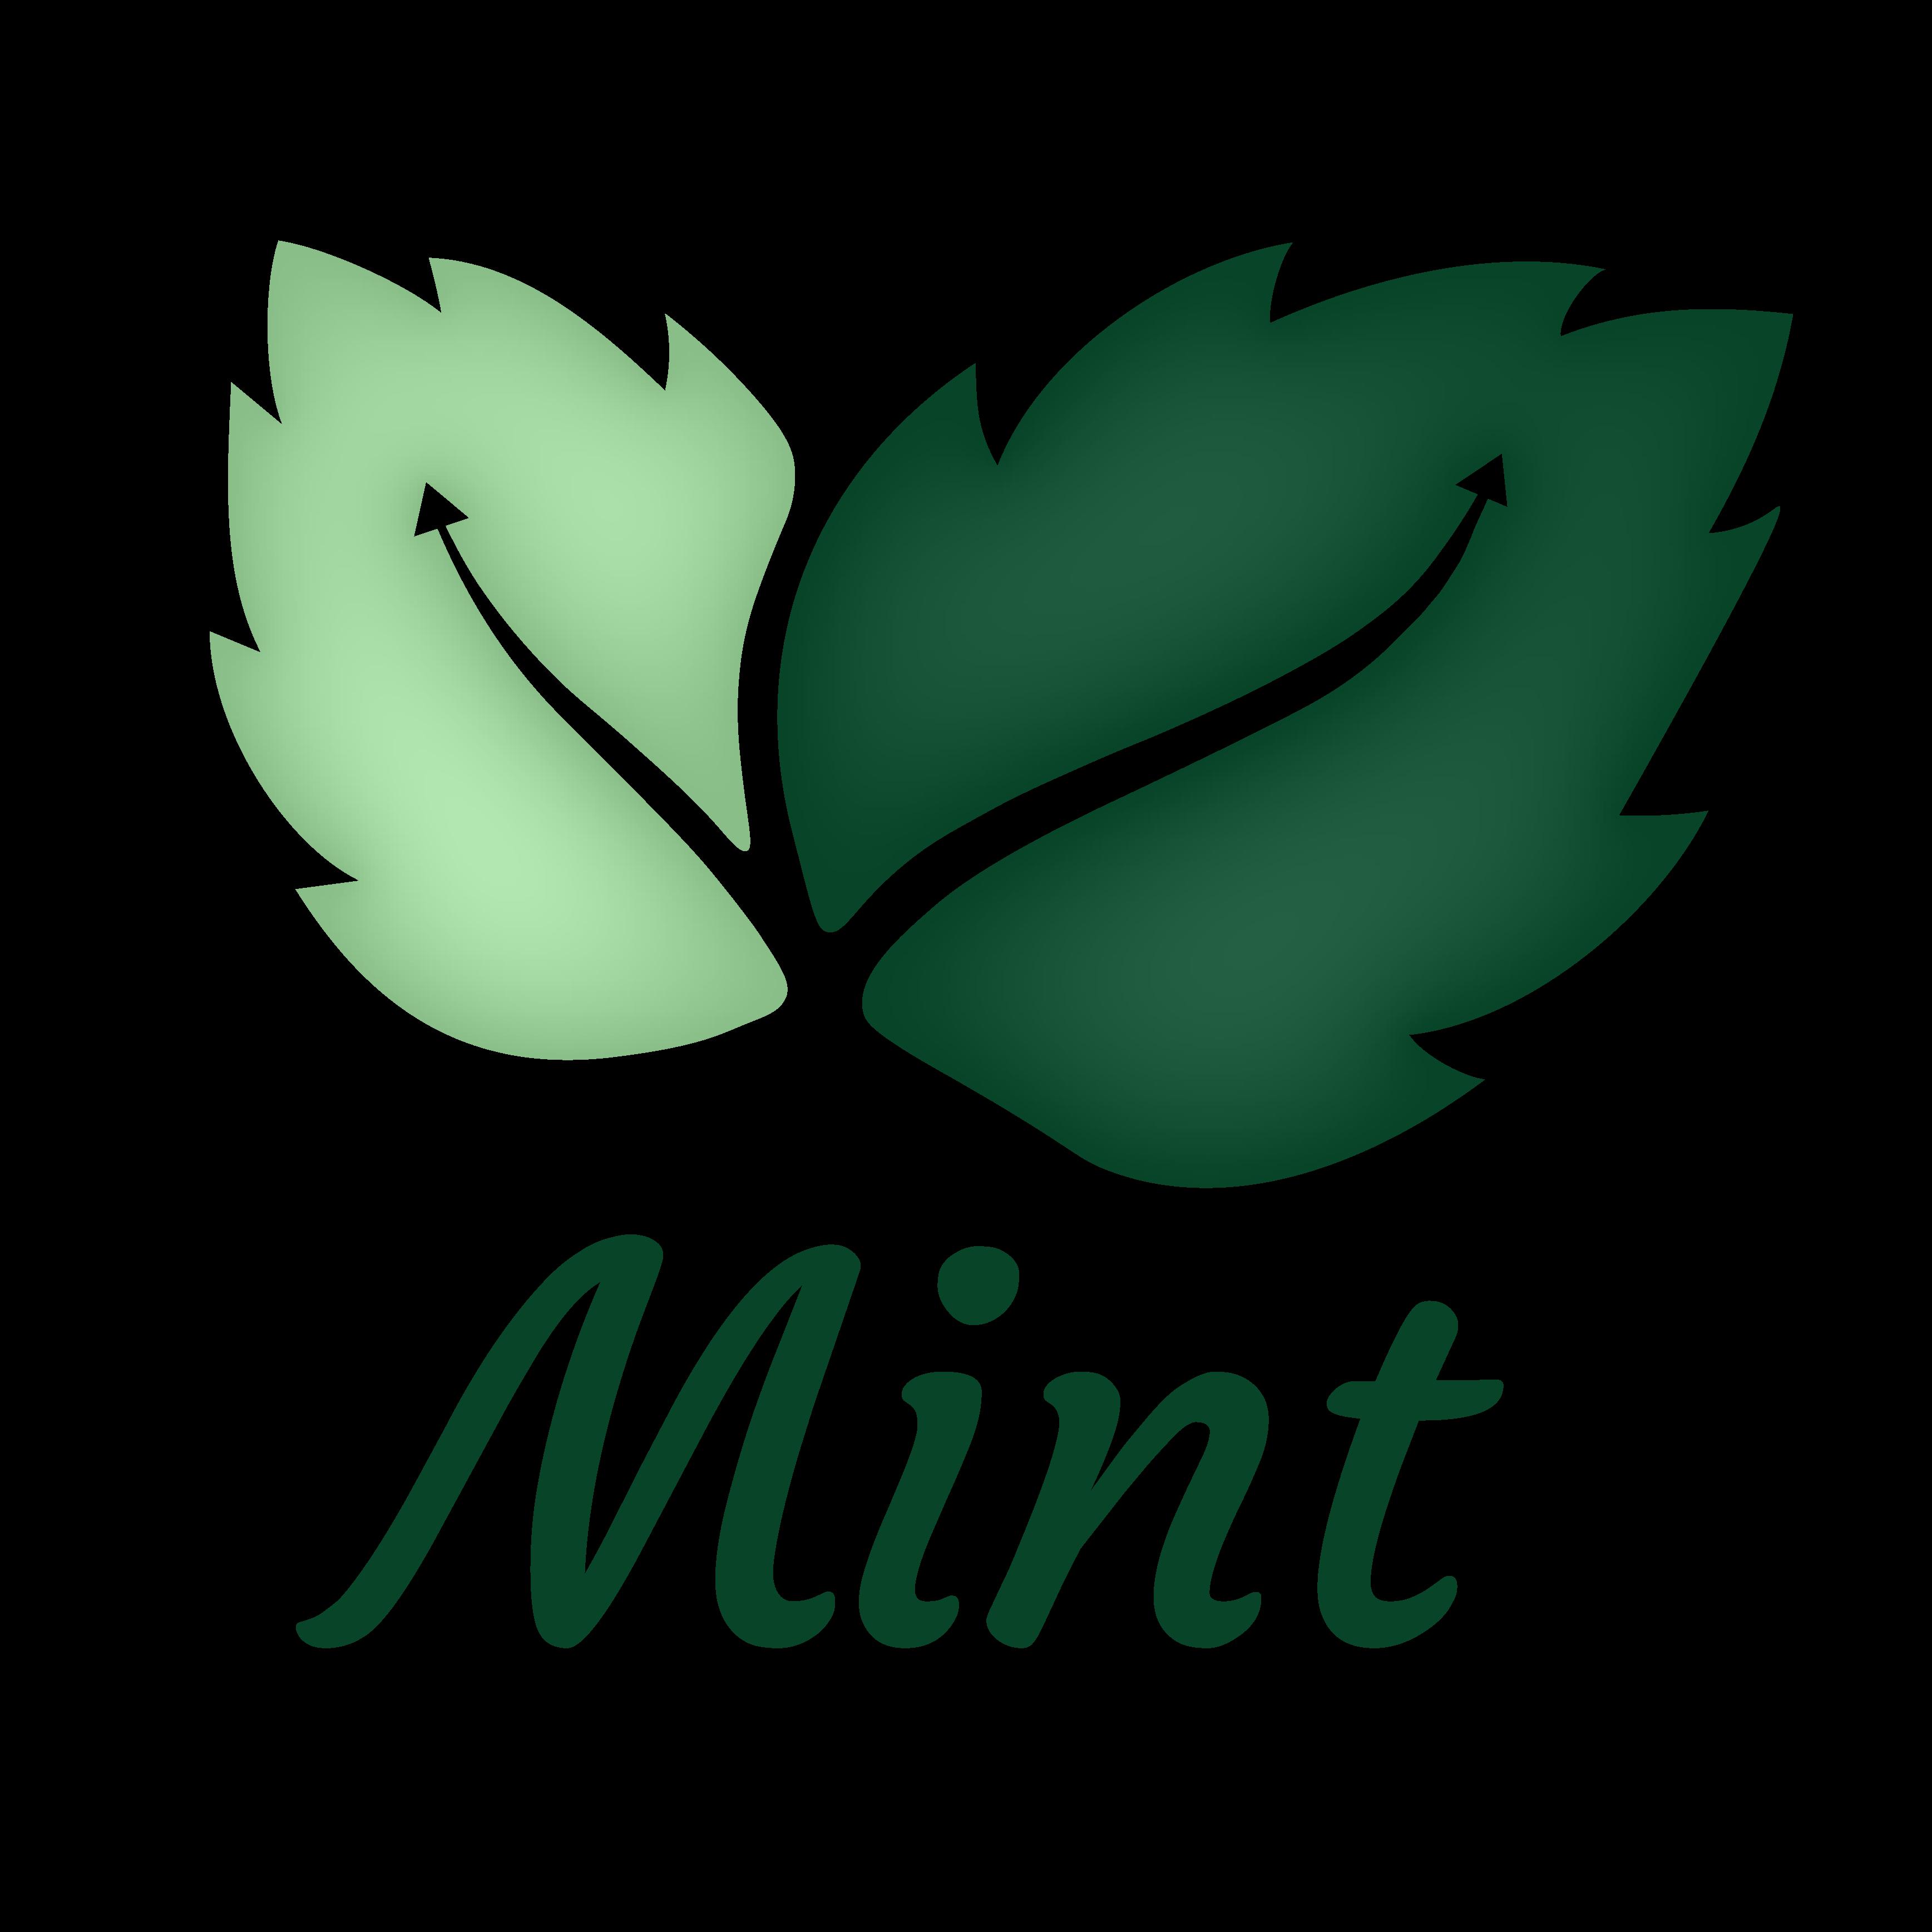 Le logo de la future application Mint